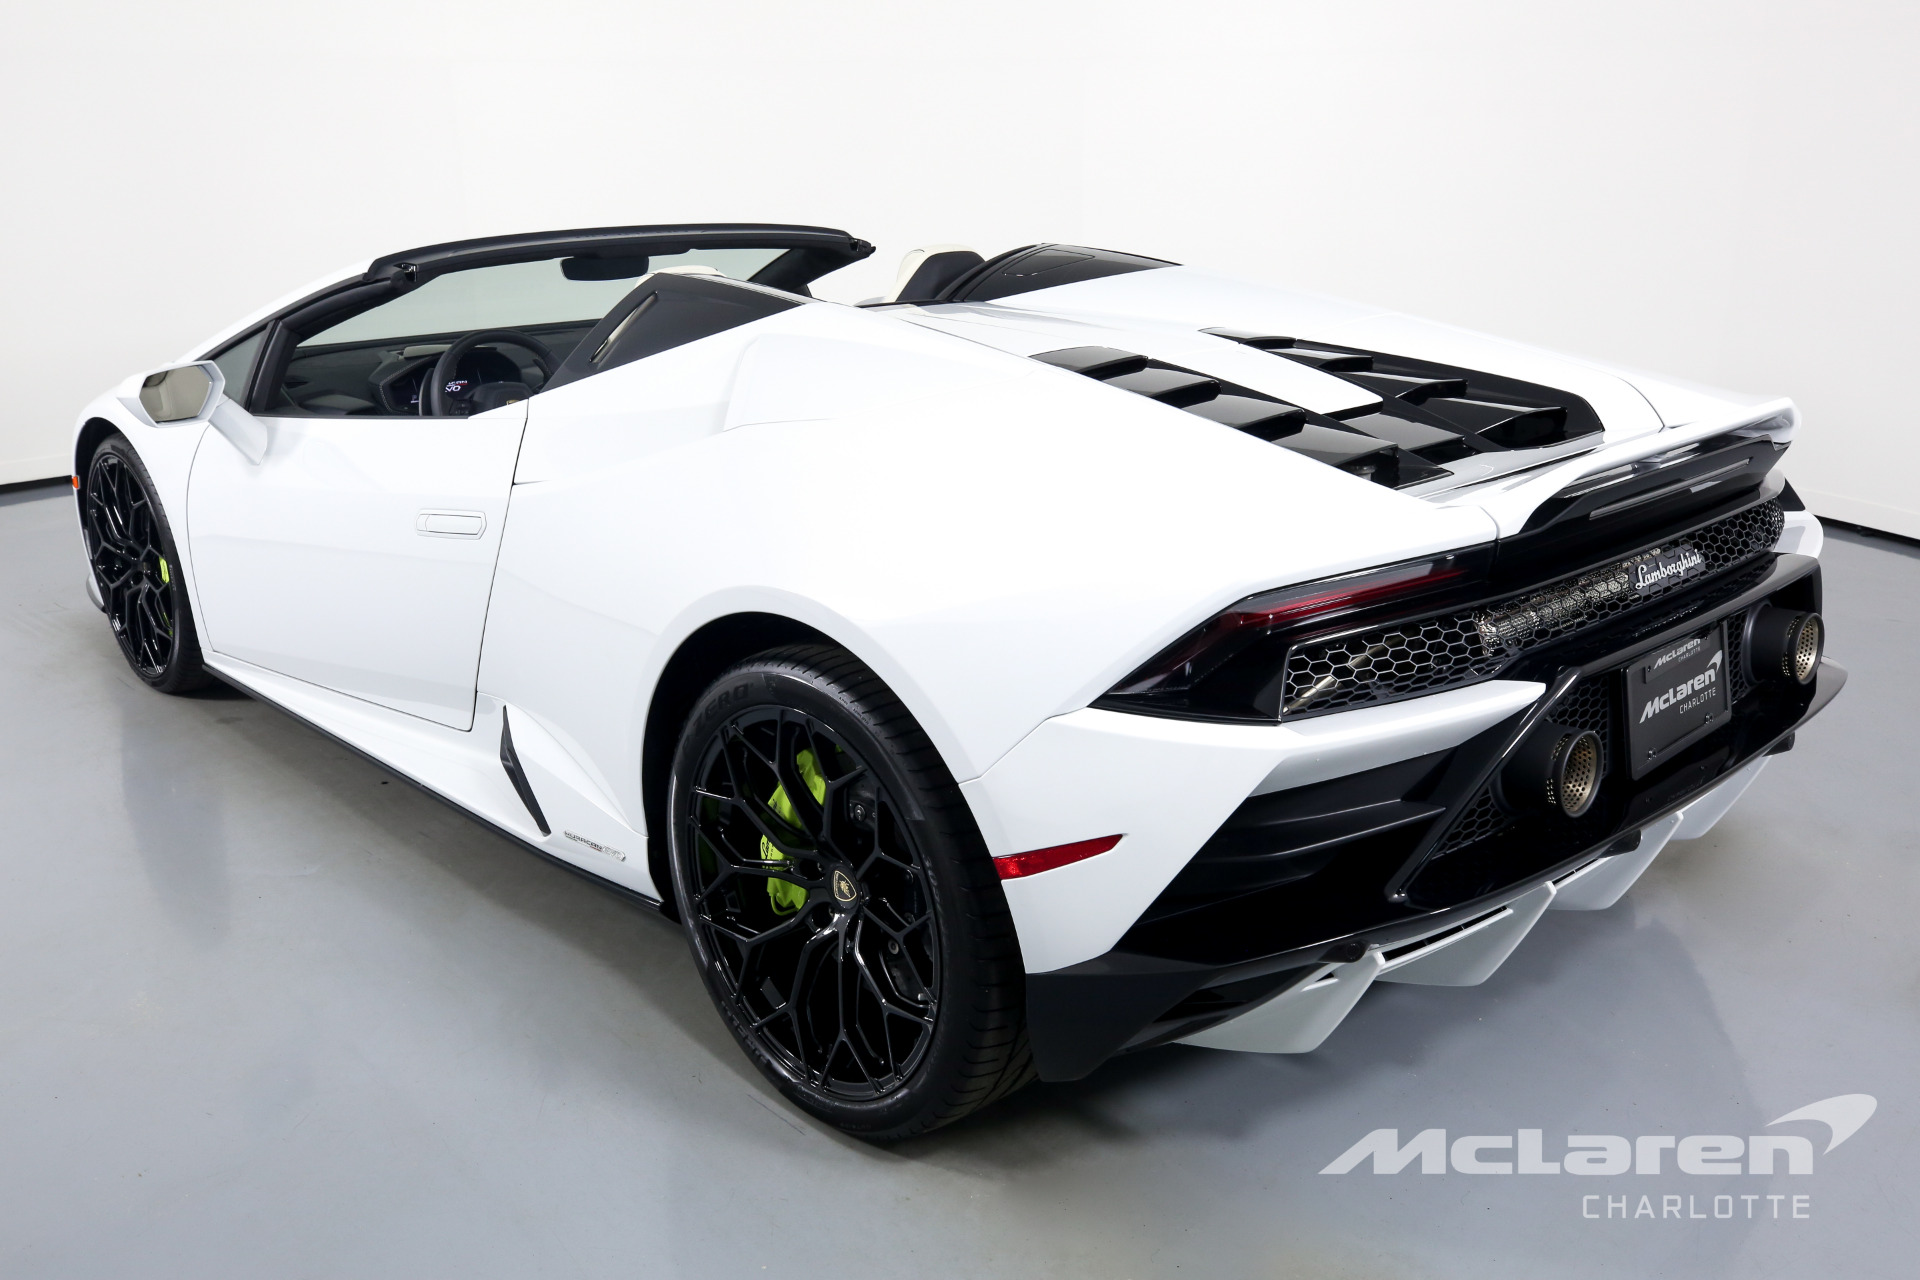 Used 2020 Lamborghini Huracan LP 640-4 EVO Spyder | Charlotte, NC